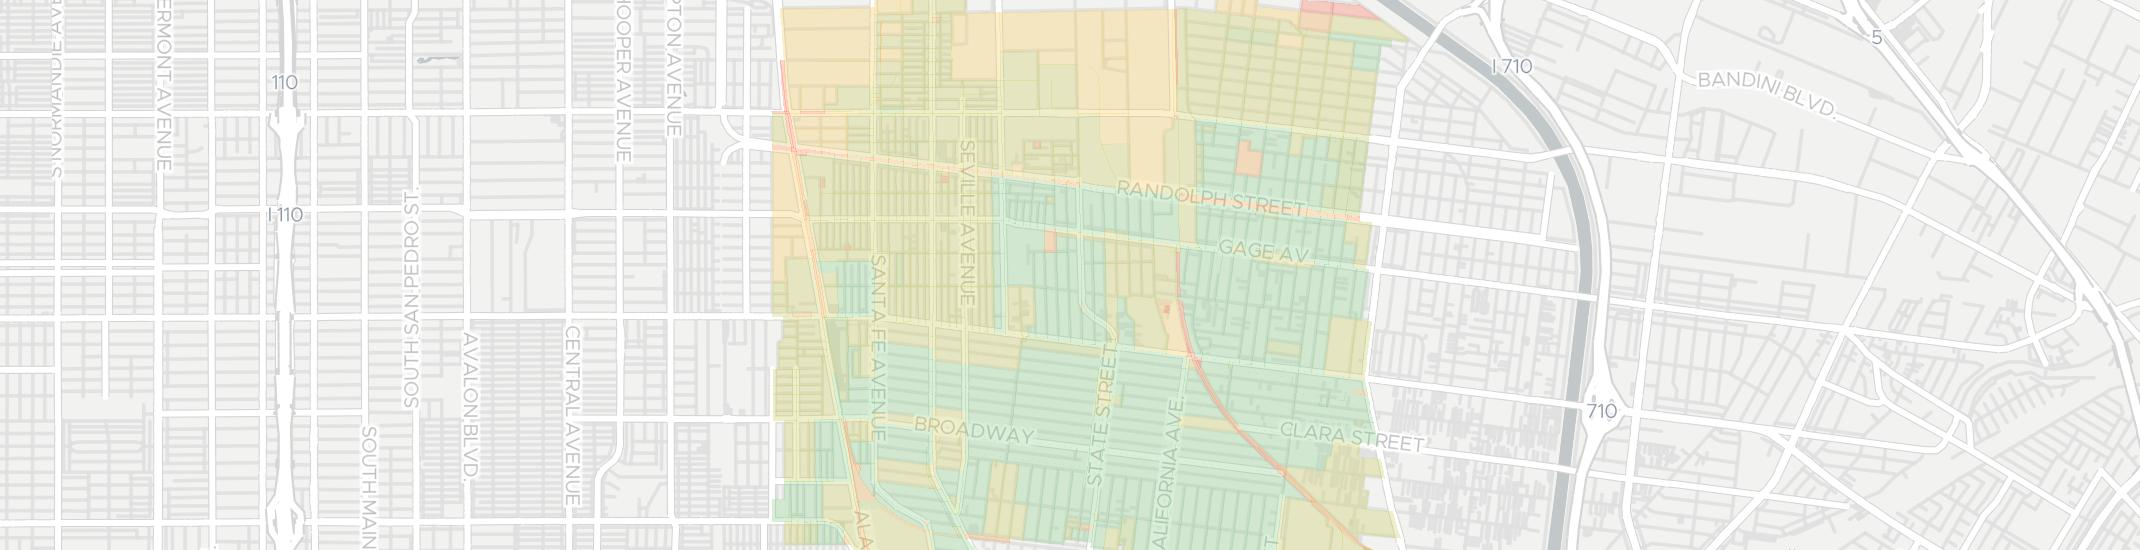 Huntington Park Zip Code Map.Huntington Park Zip Code Map Www Topsimages Com